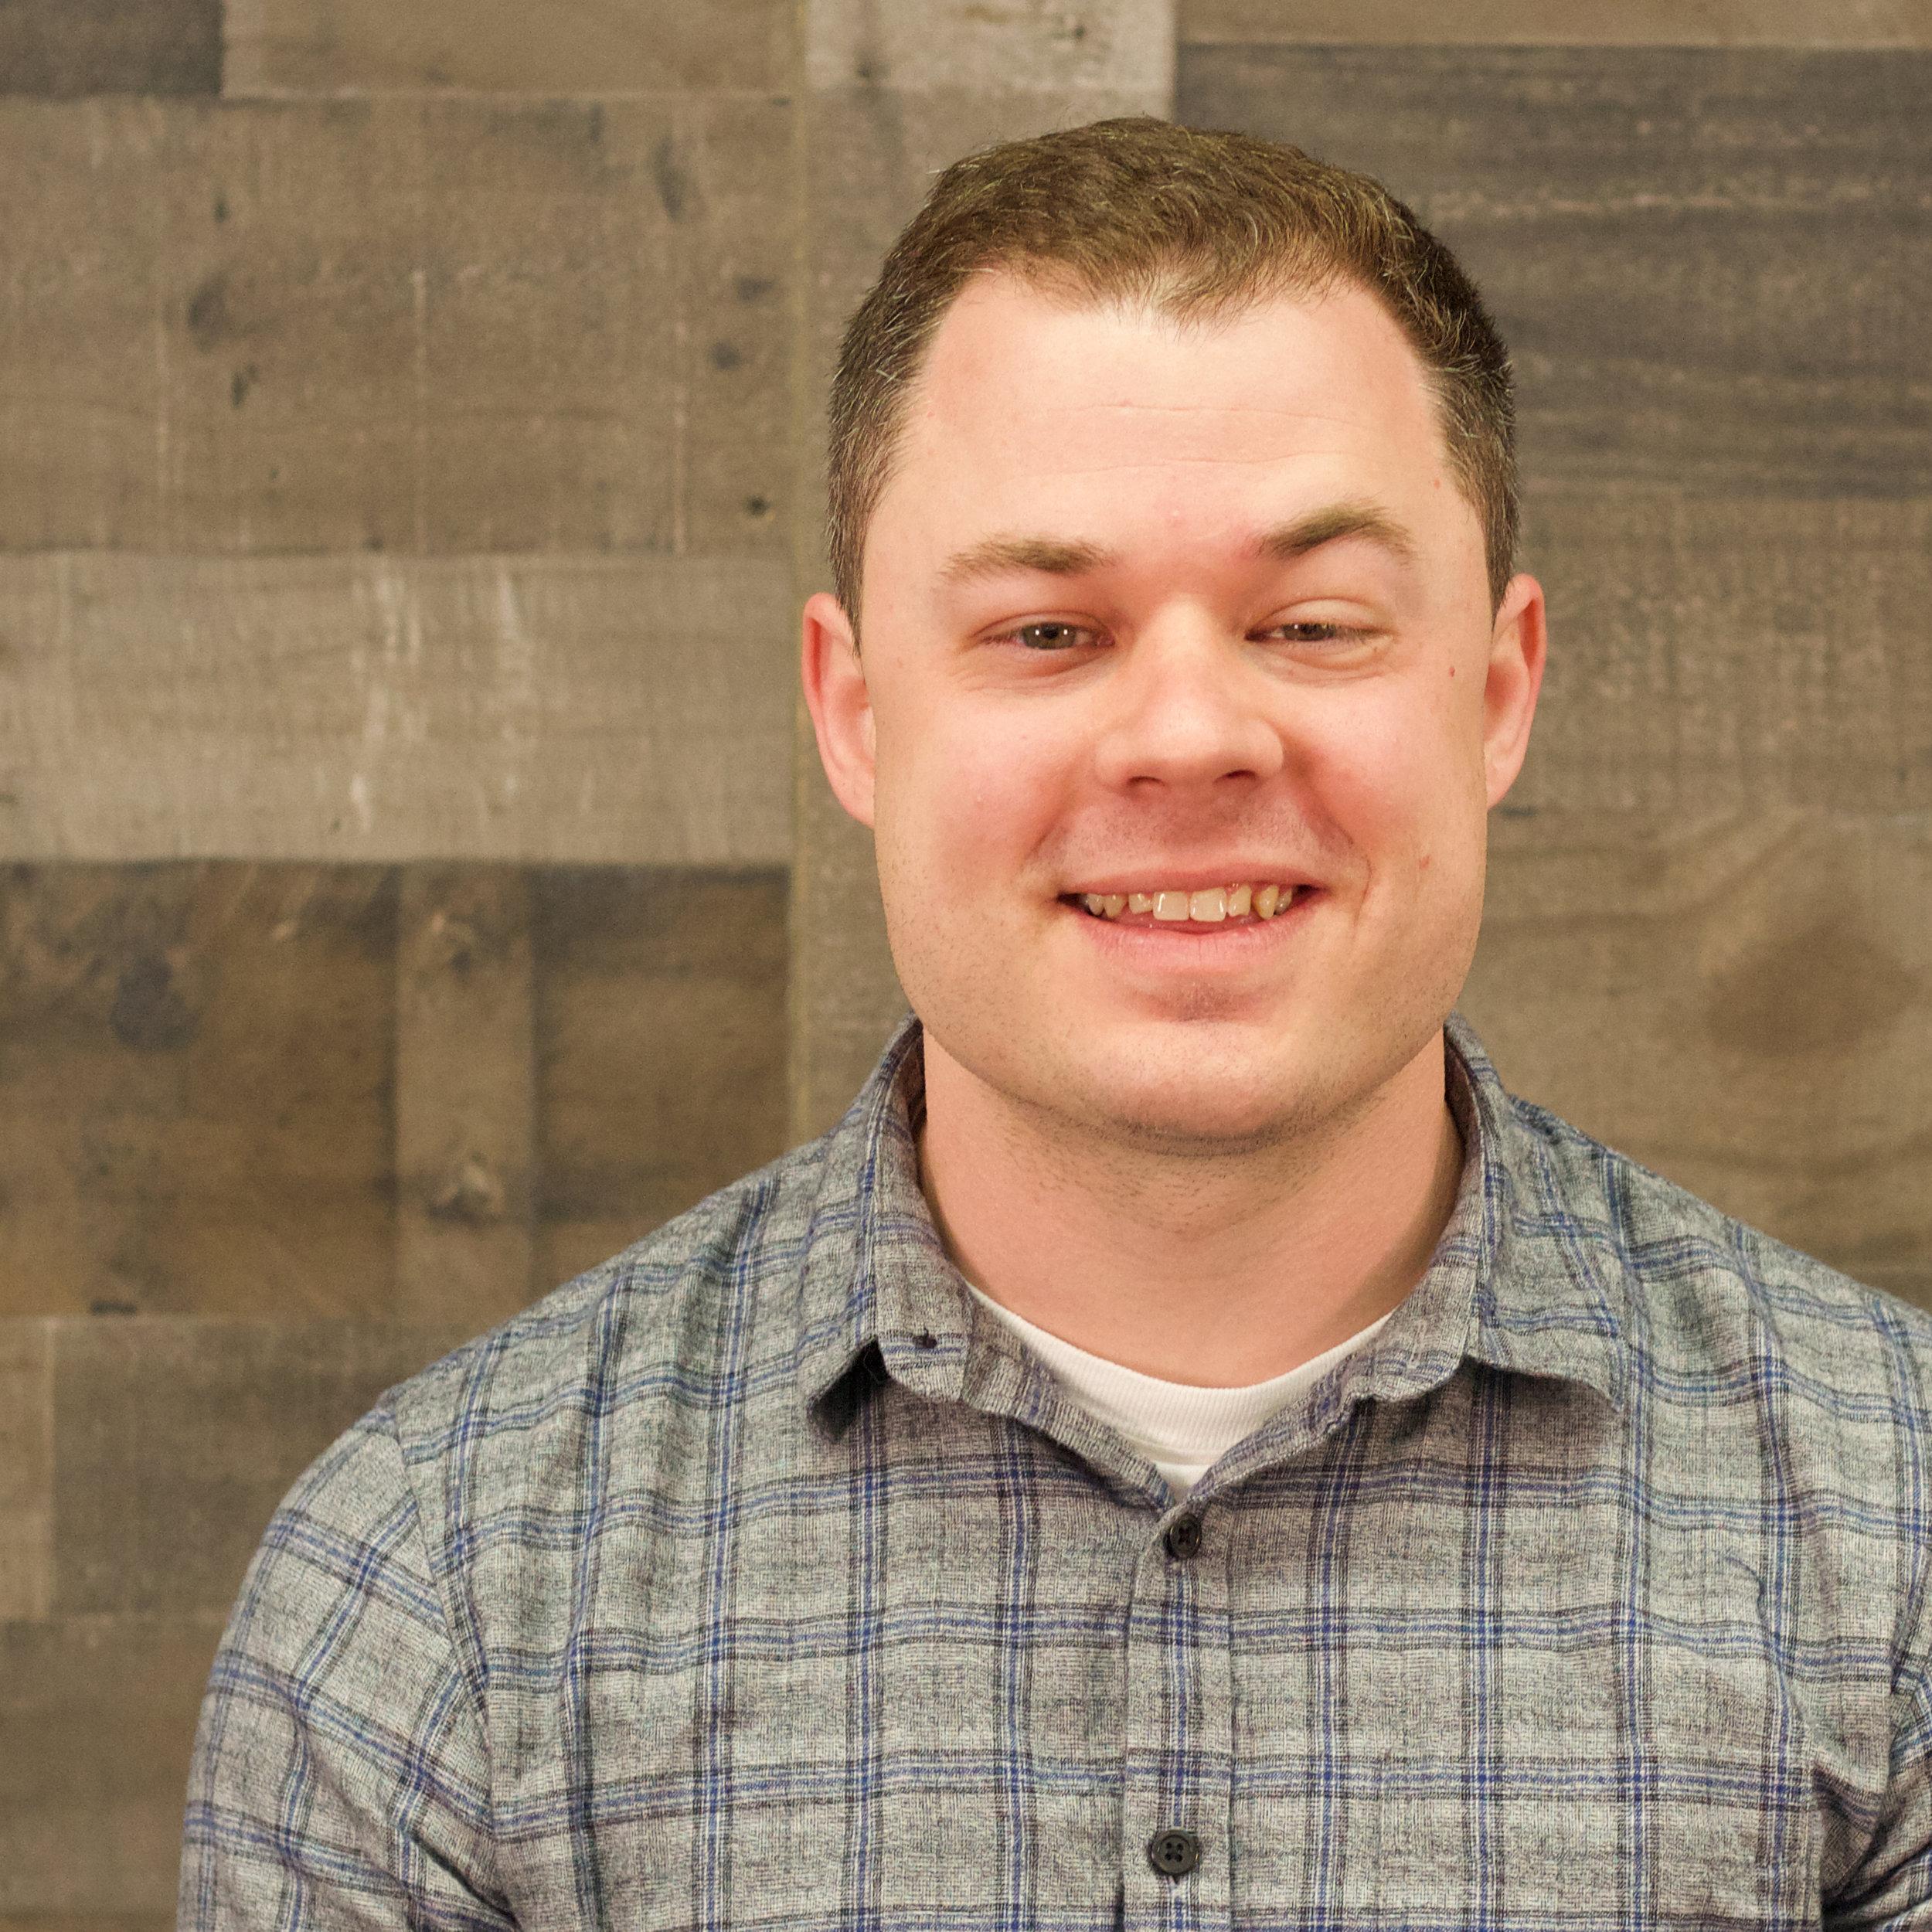 John Bollinger - Discipleship & Connections PastorEmail: john@gccstl.org